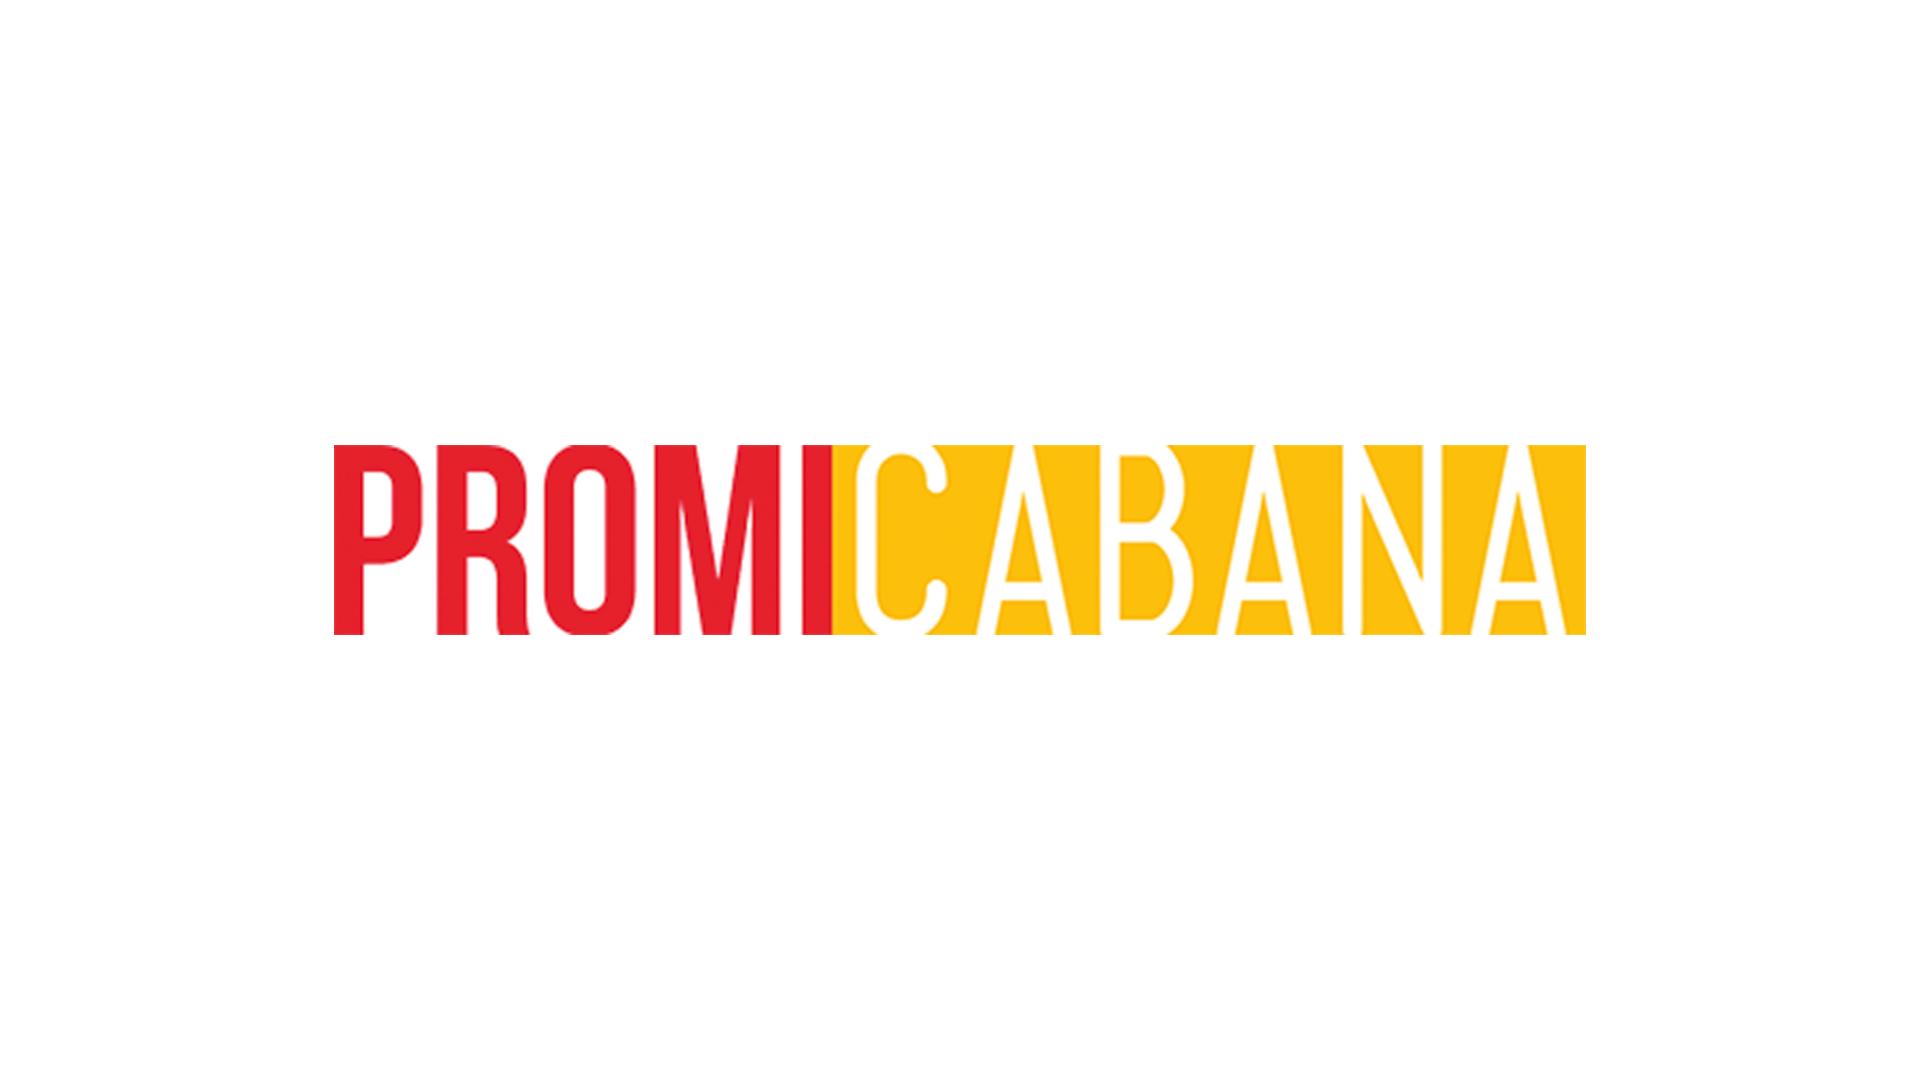 Channing-Tatum-George-Clooney